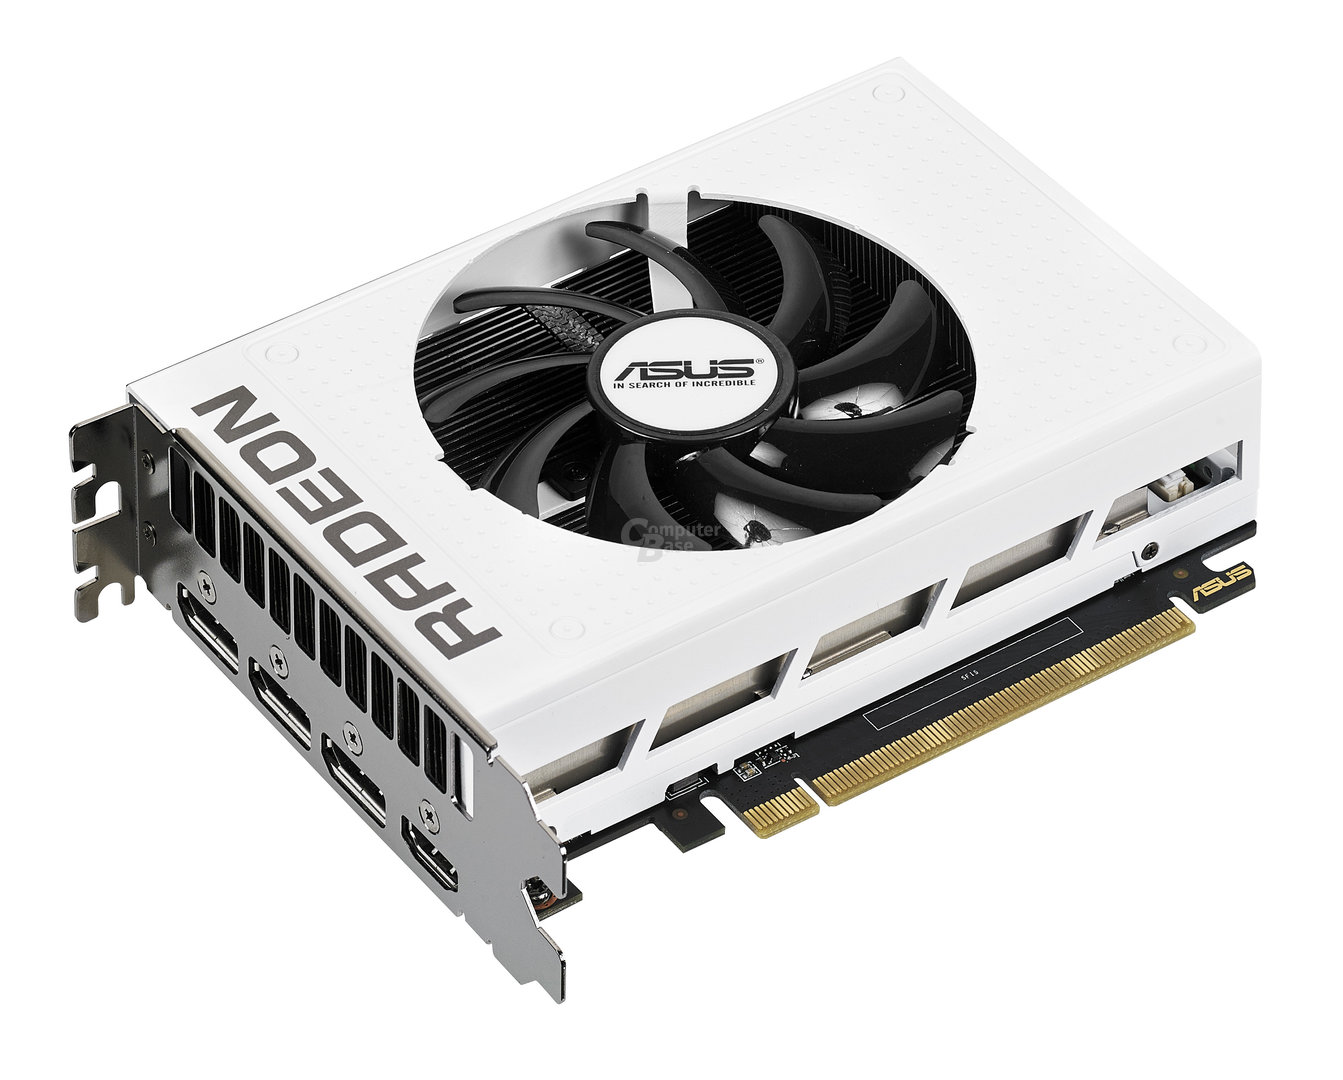 ASUS makes white Radeon R9 Nano   VideoCardz com